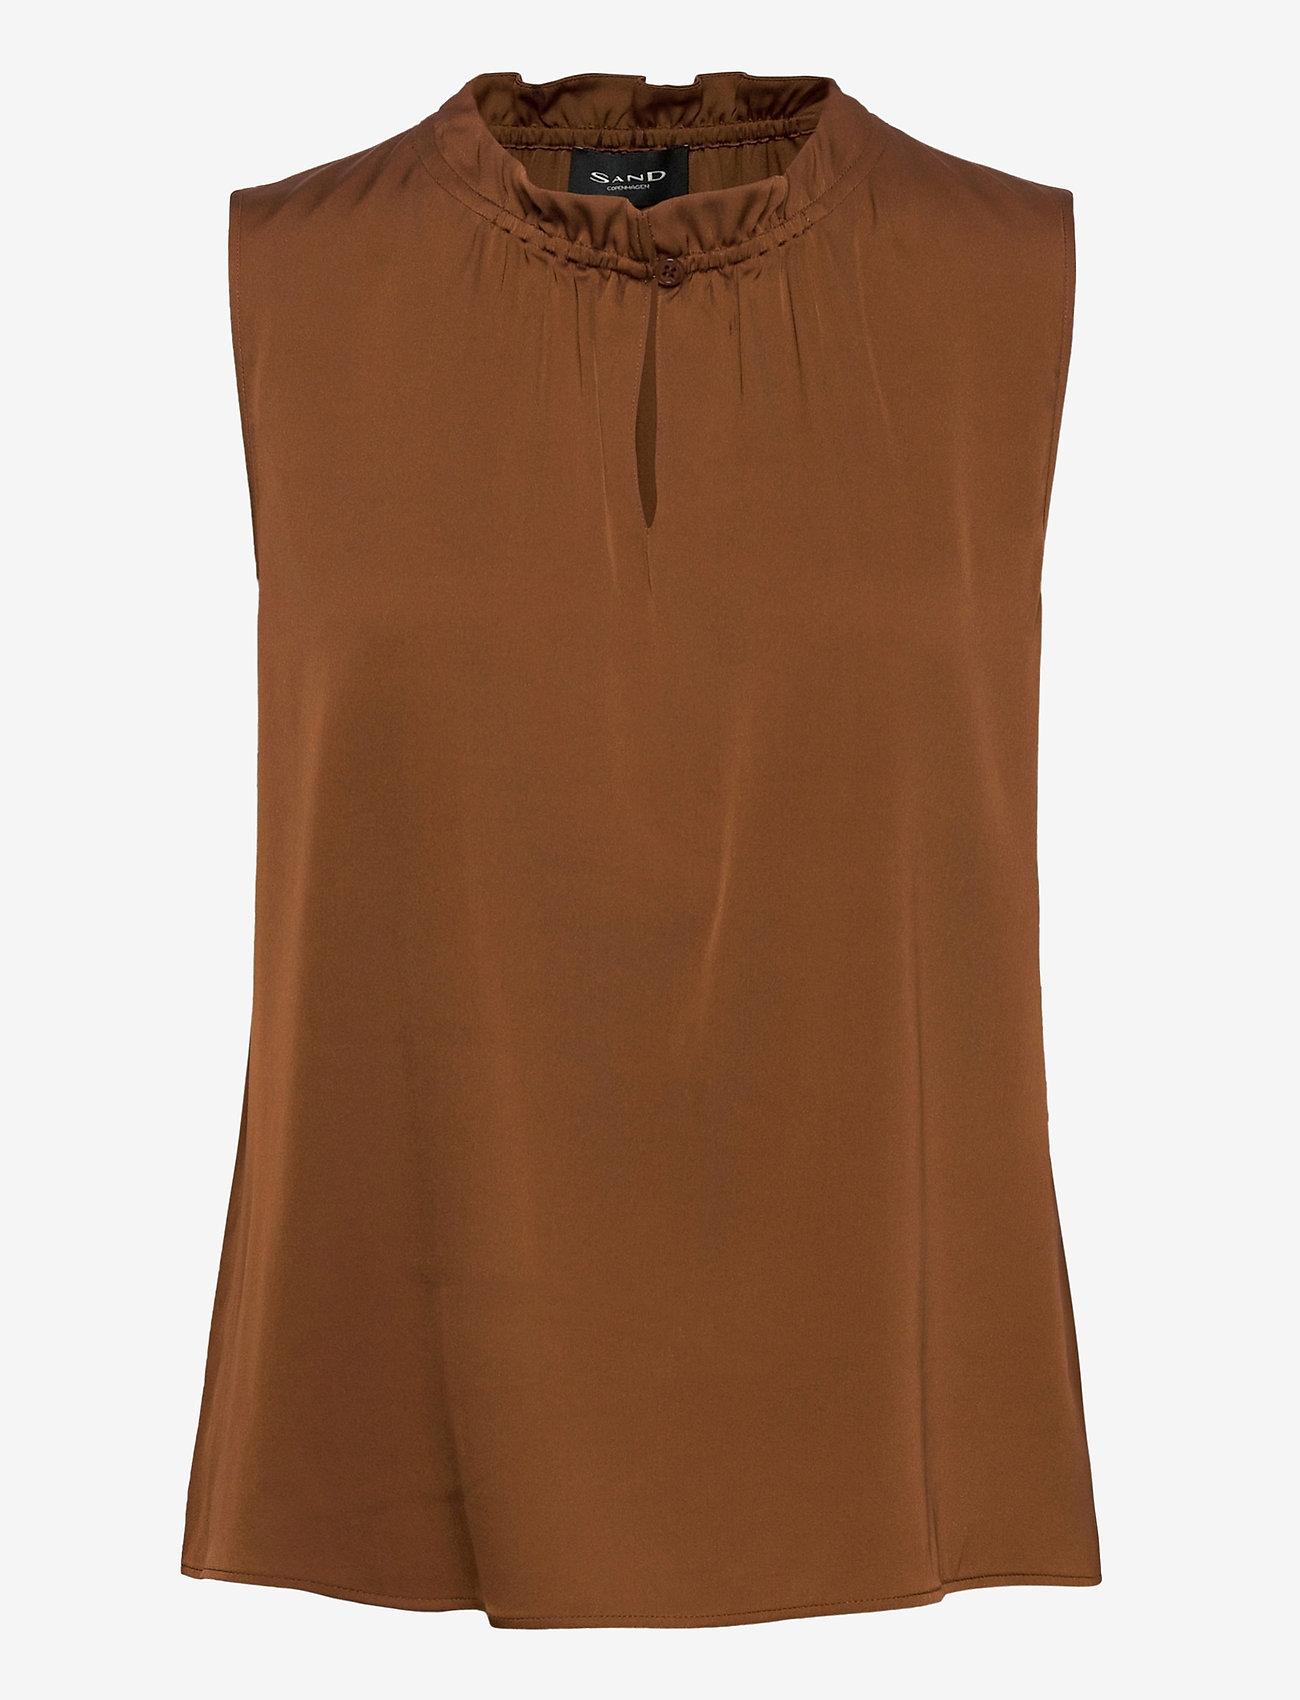 SAND - Satin Stretch - Raya F - blouses zonder mouwen - copper - 0